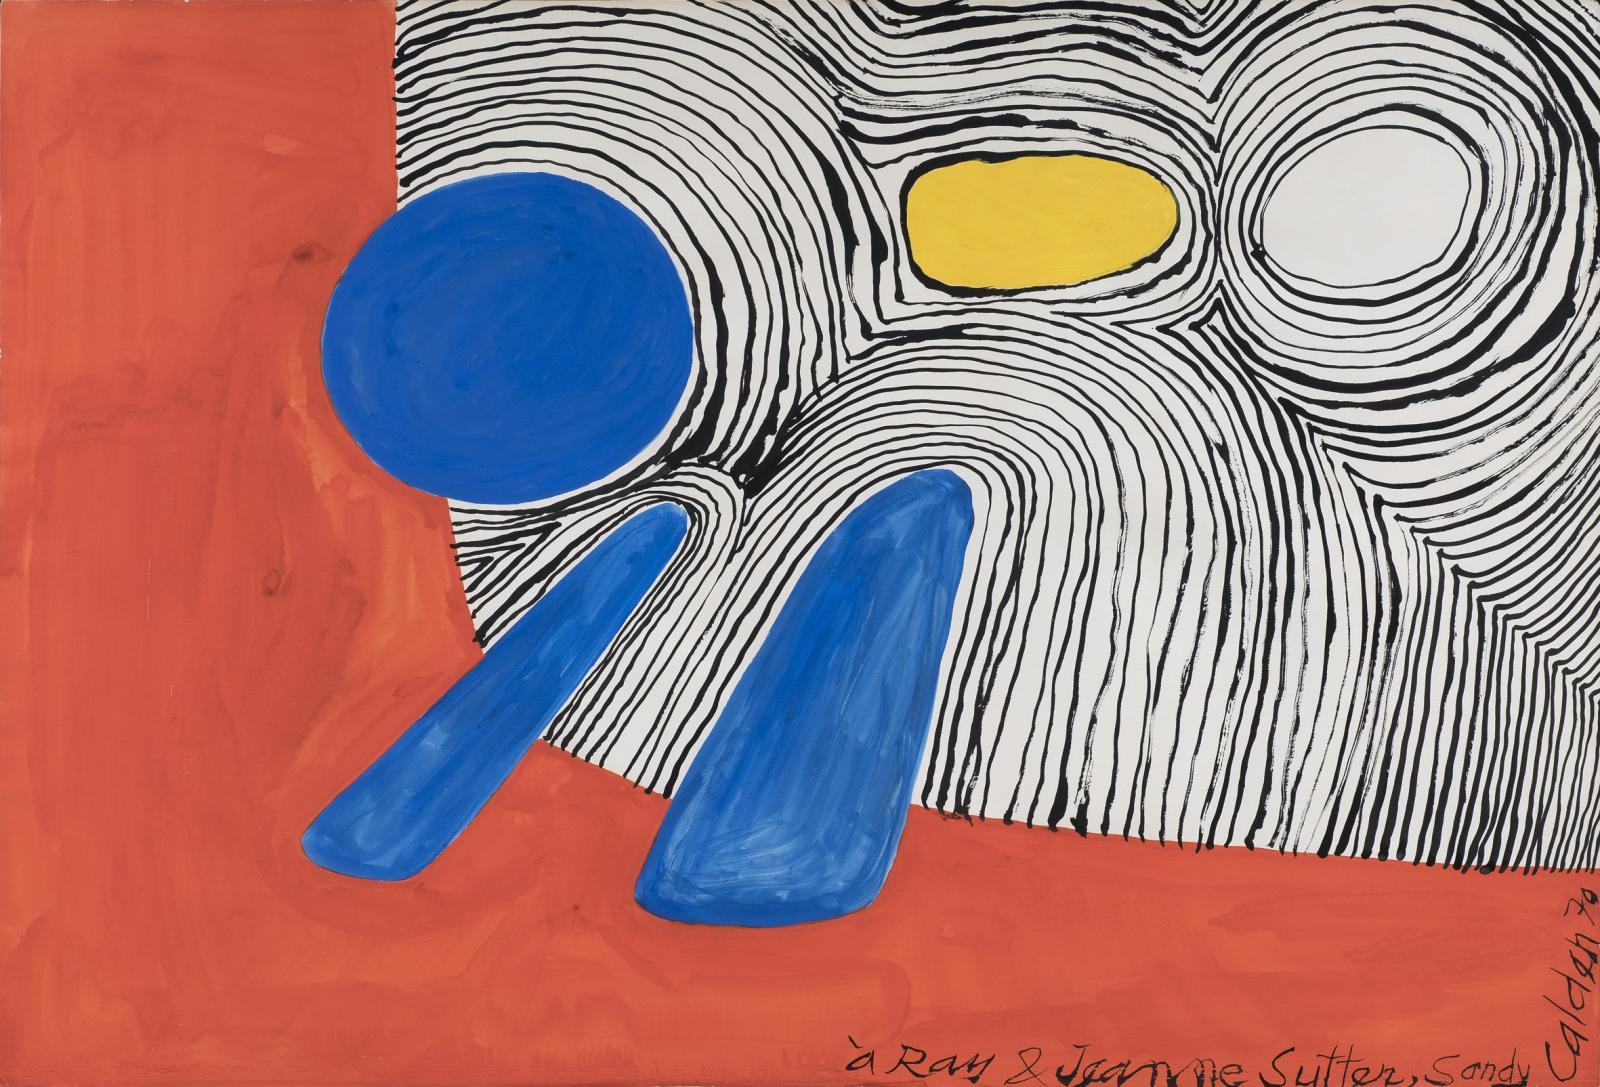 Alexander Calder, Sans Titre, 1970